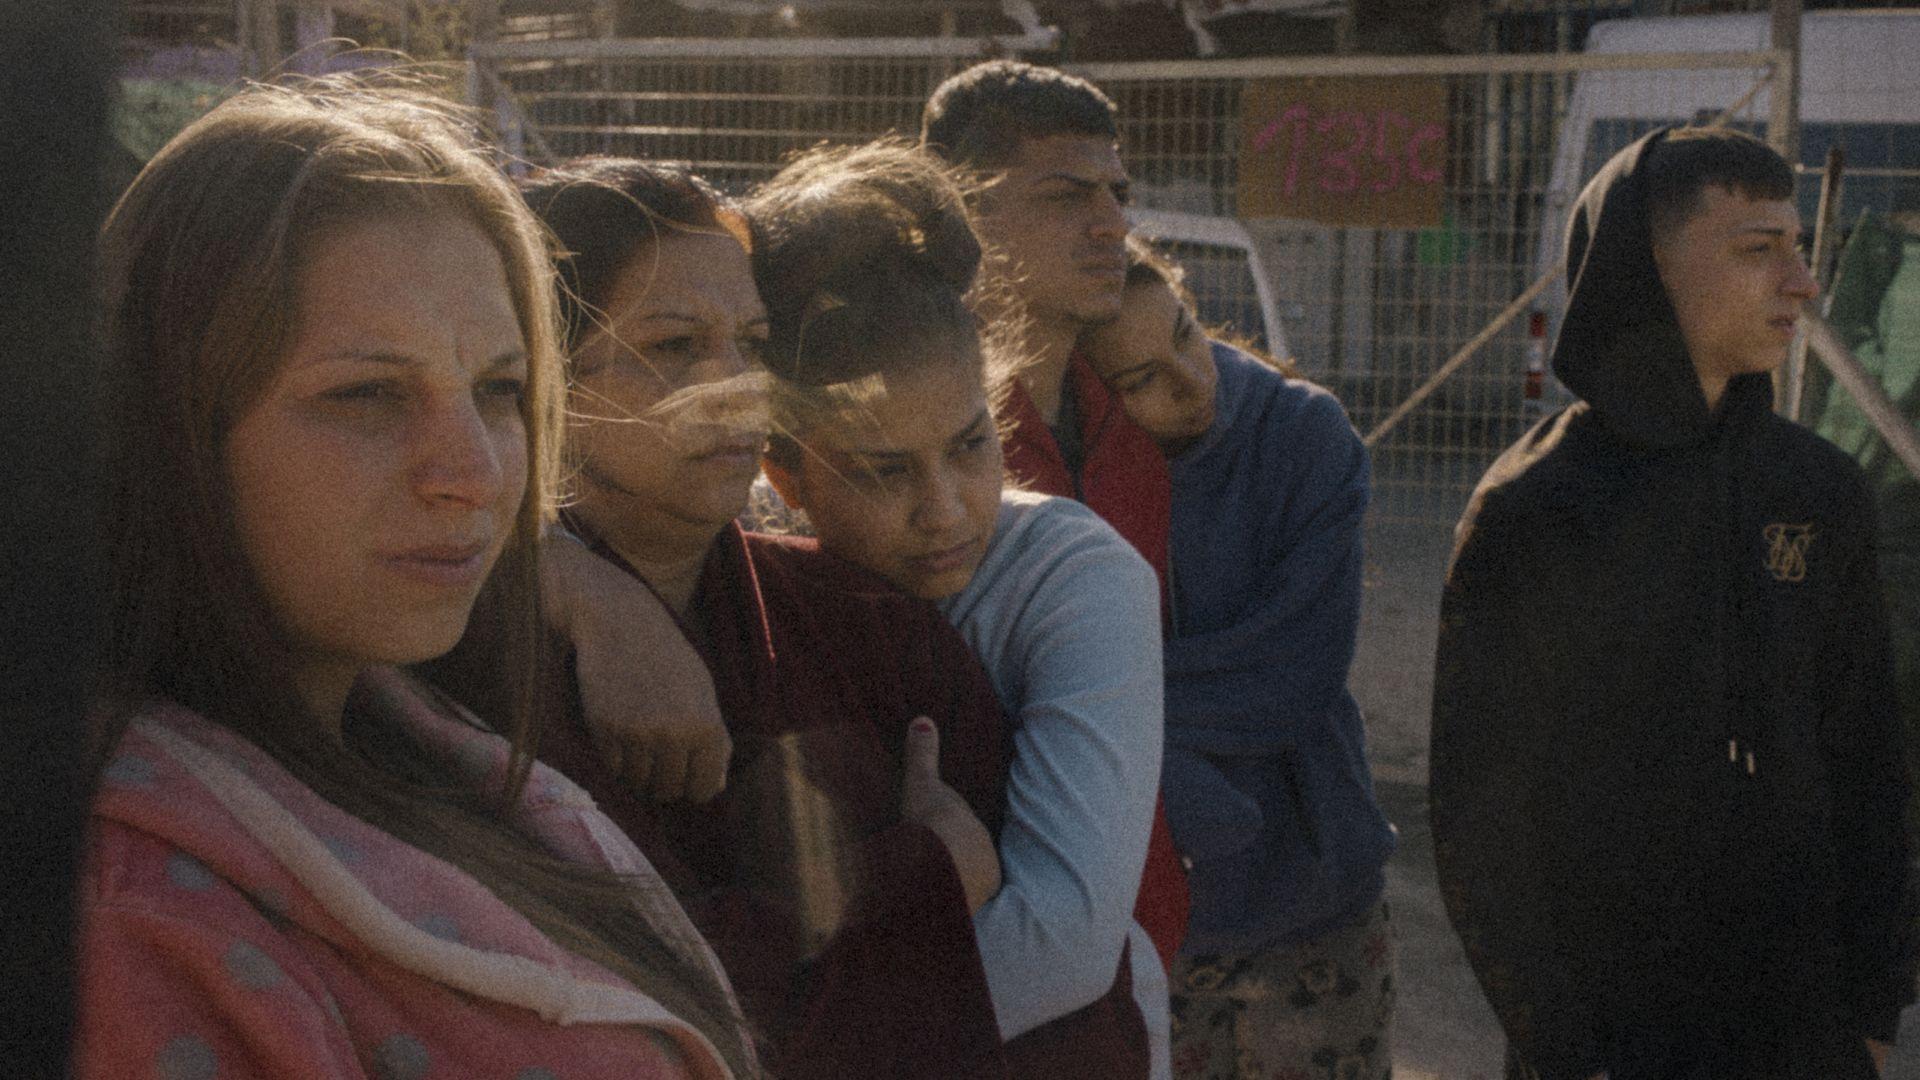 Sociaal-realistisch drama in nieuwe film La última primavera